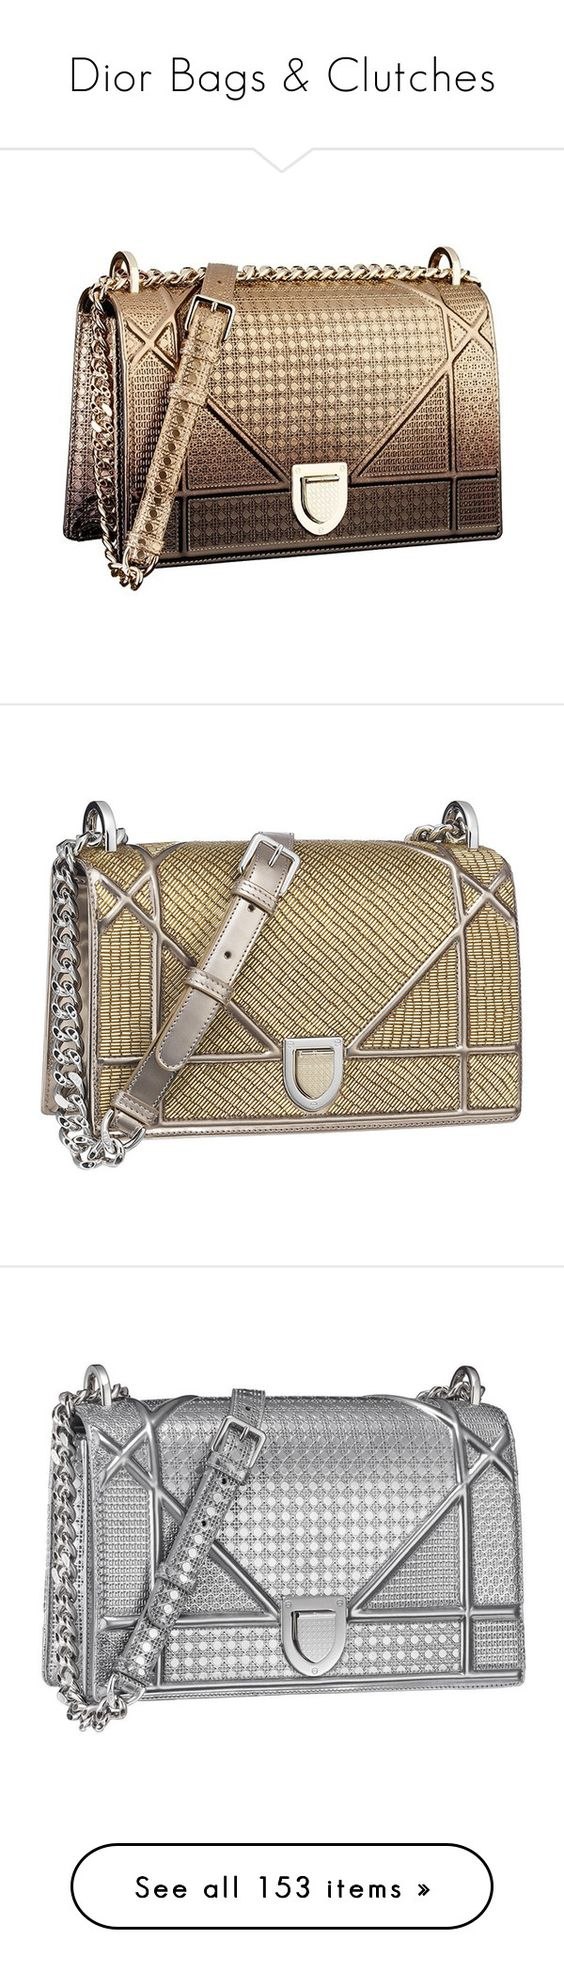 """Dior Bags & Clutches"" by sakuragirl ❤ liked on Polyvore featuring bags, dior, bolsas, clutches, sac, christian dior, handbags, esprit handbags, borse and wallets"